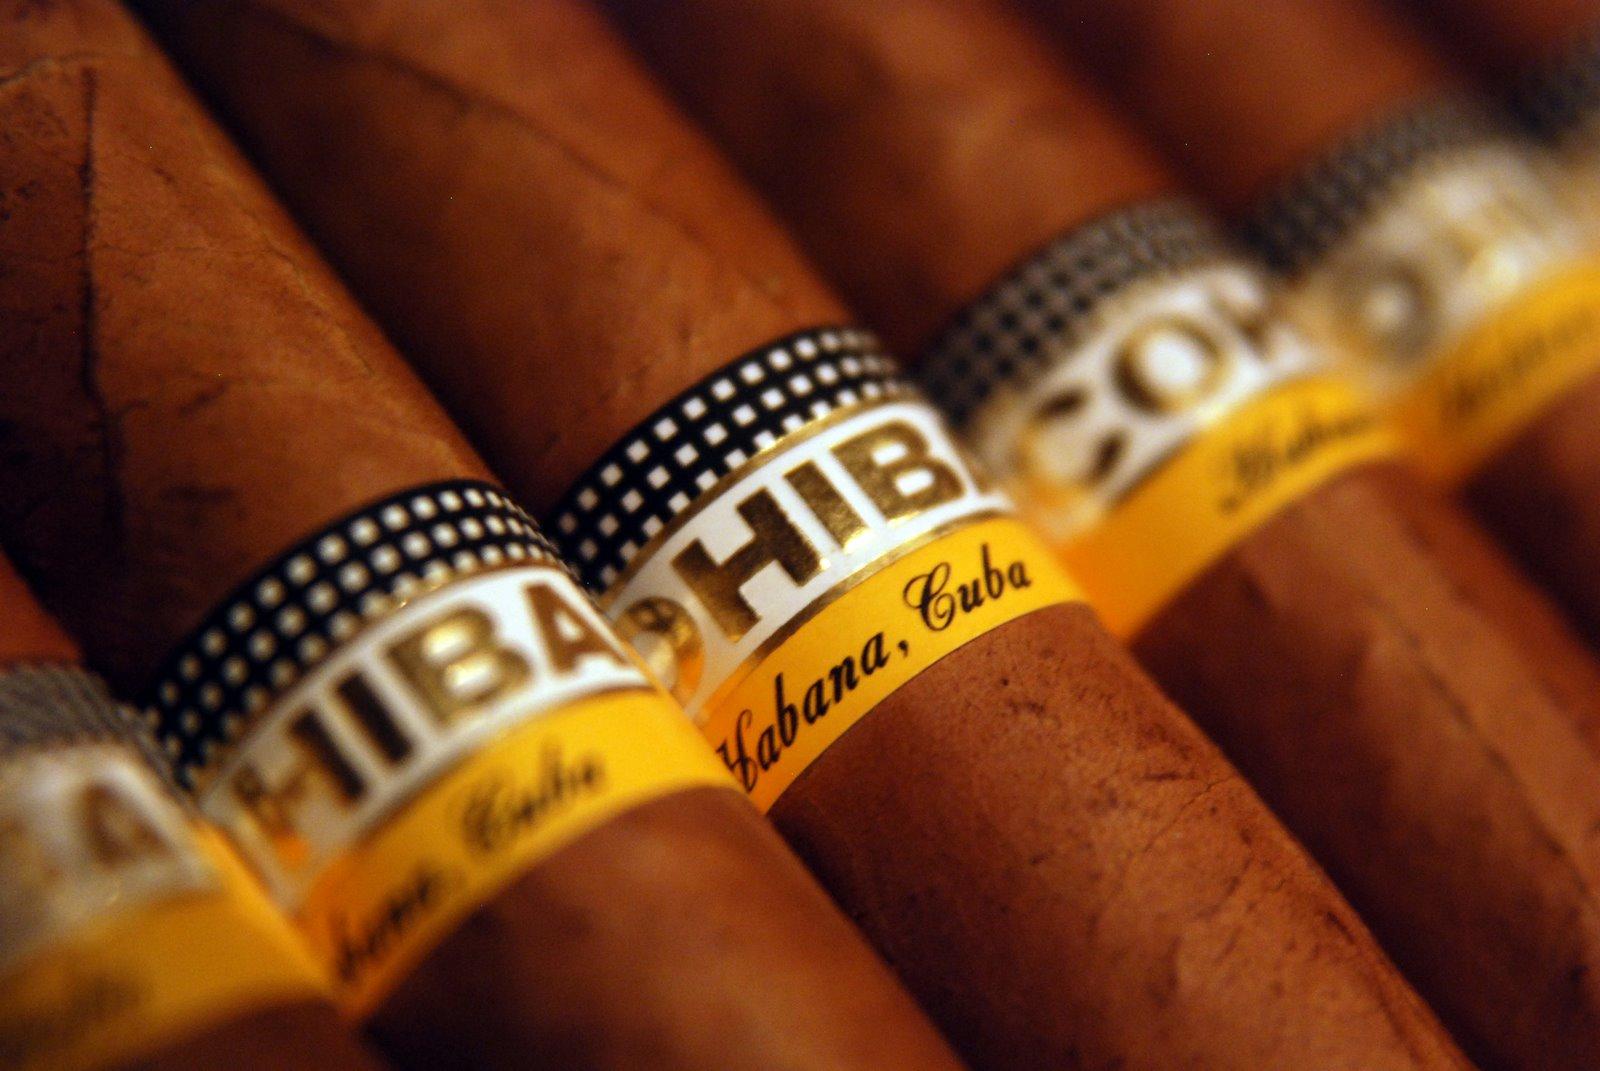 cohiba_habanos_cigar_szivarvilag_cohiba_szivar_3.jpg